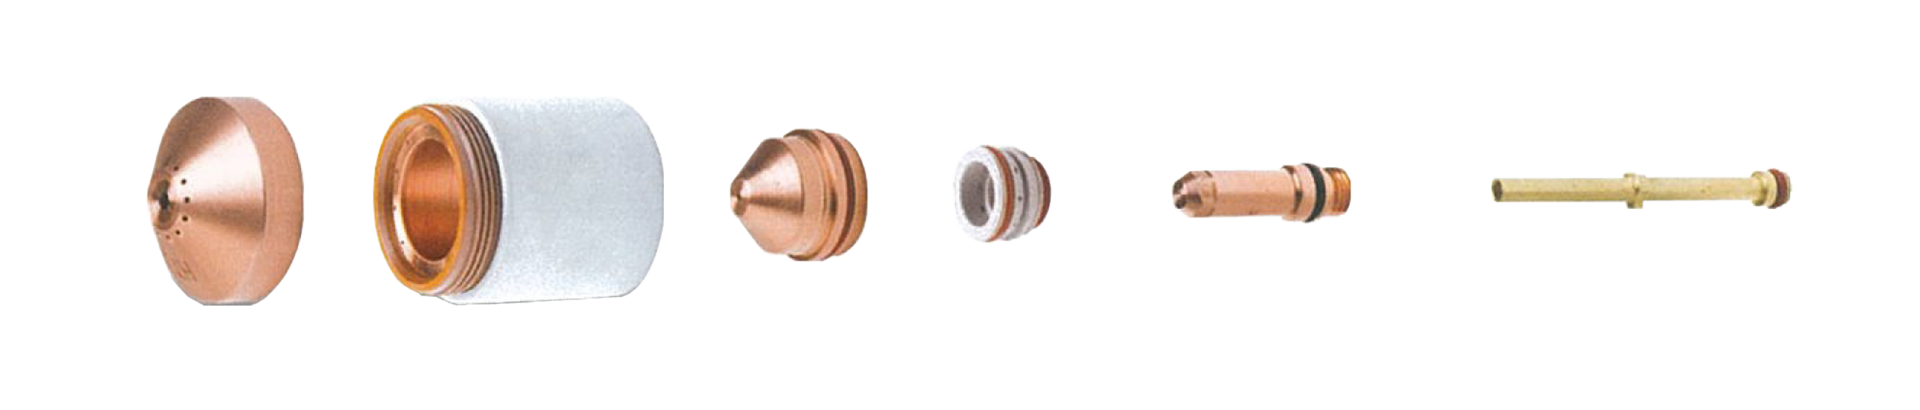 SB 870382r0 - Consommables torche plasma HSD 130 XD